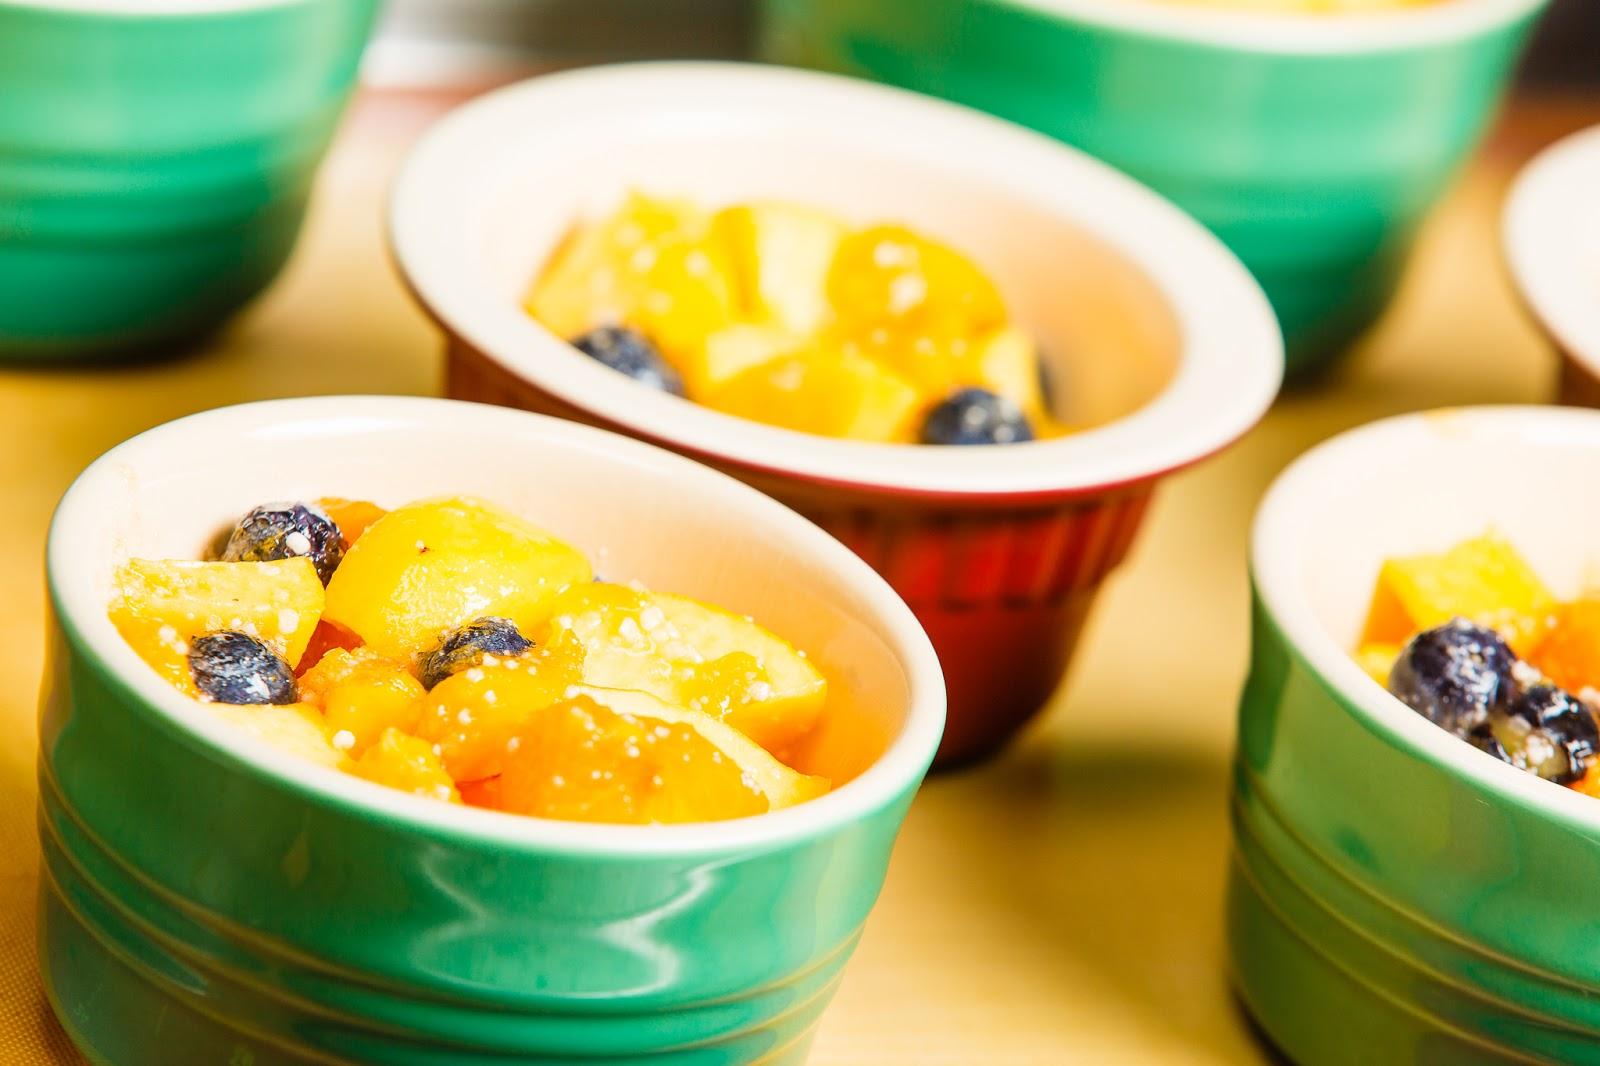 kruizing with kikukat: Cleaning out the Fridge: Fruit Crisp